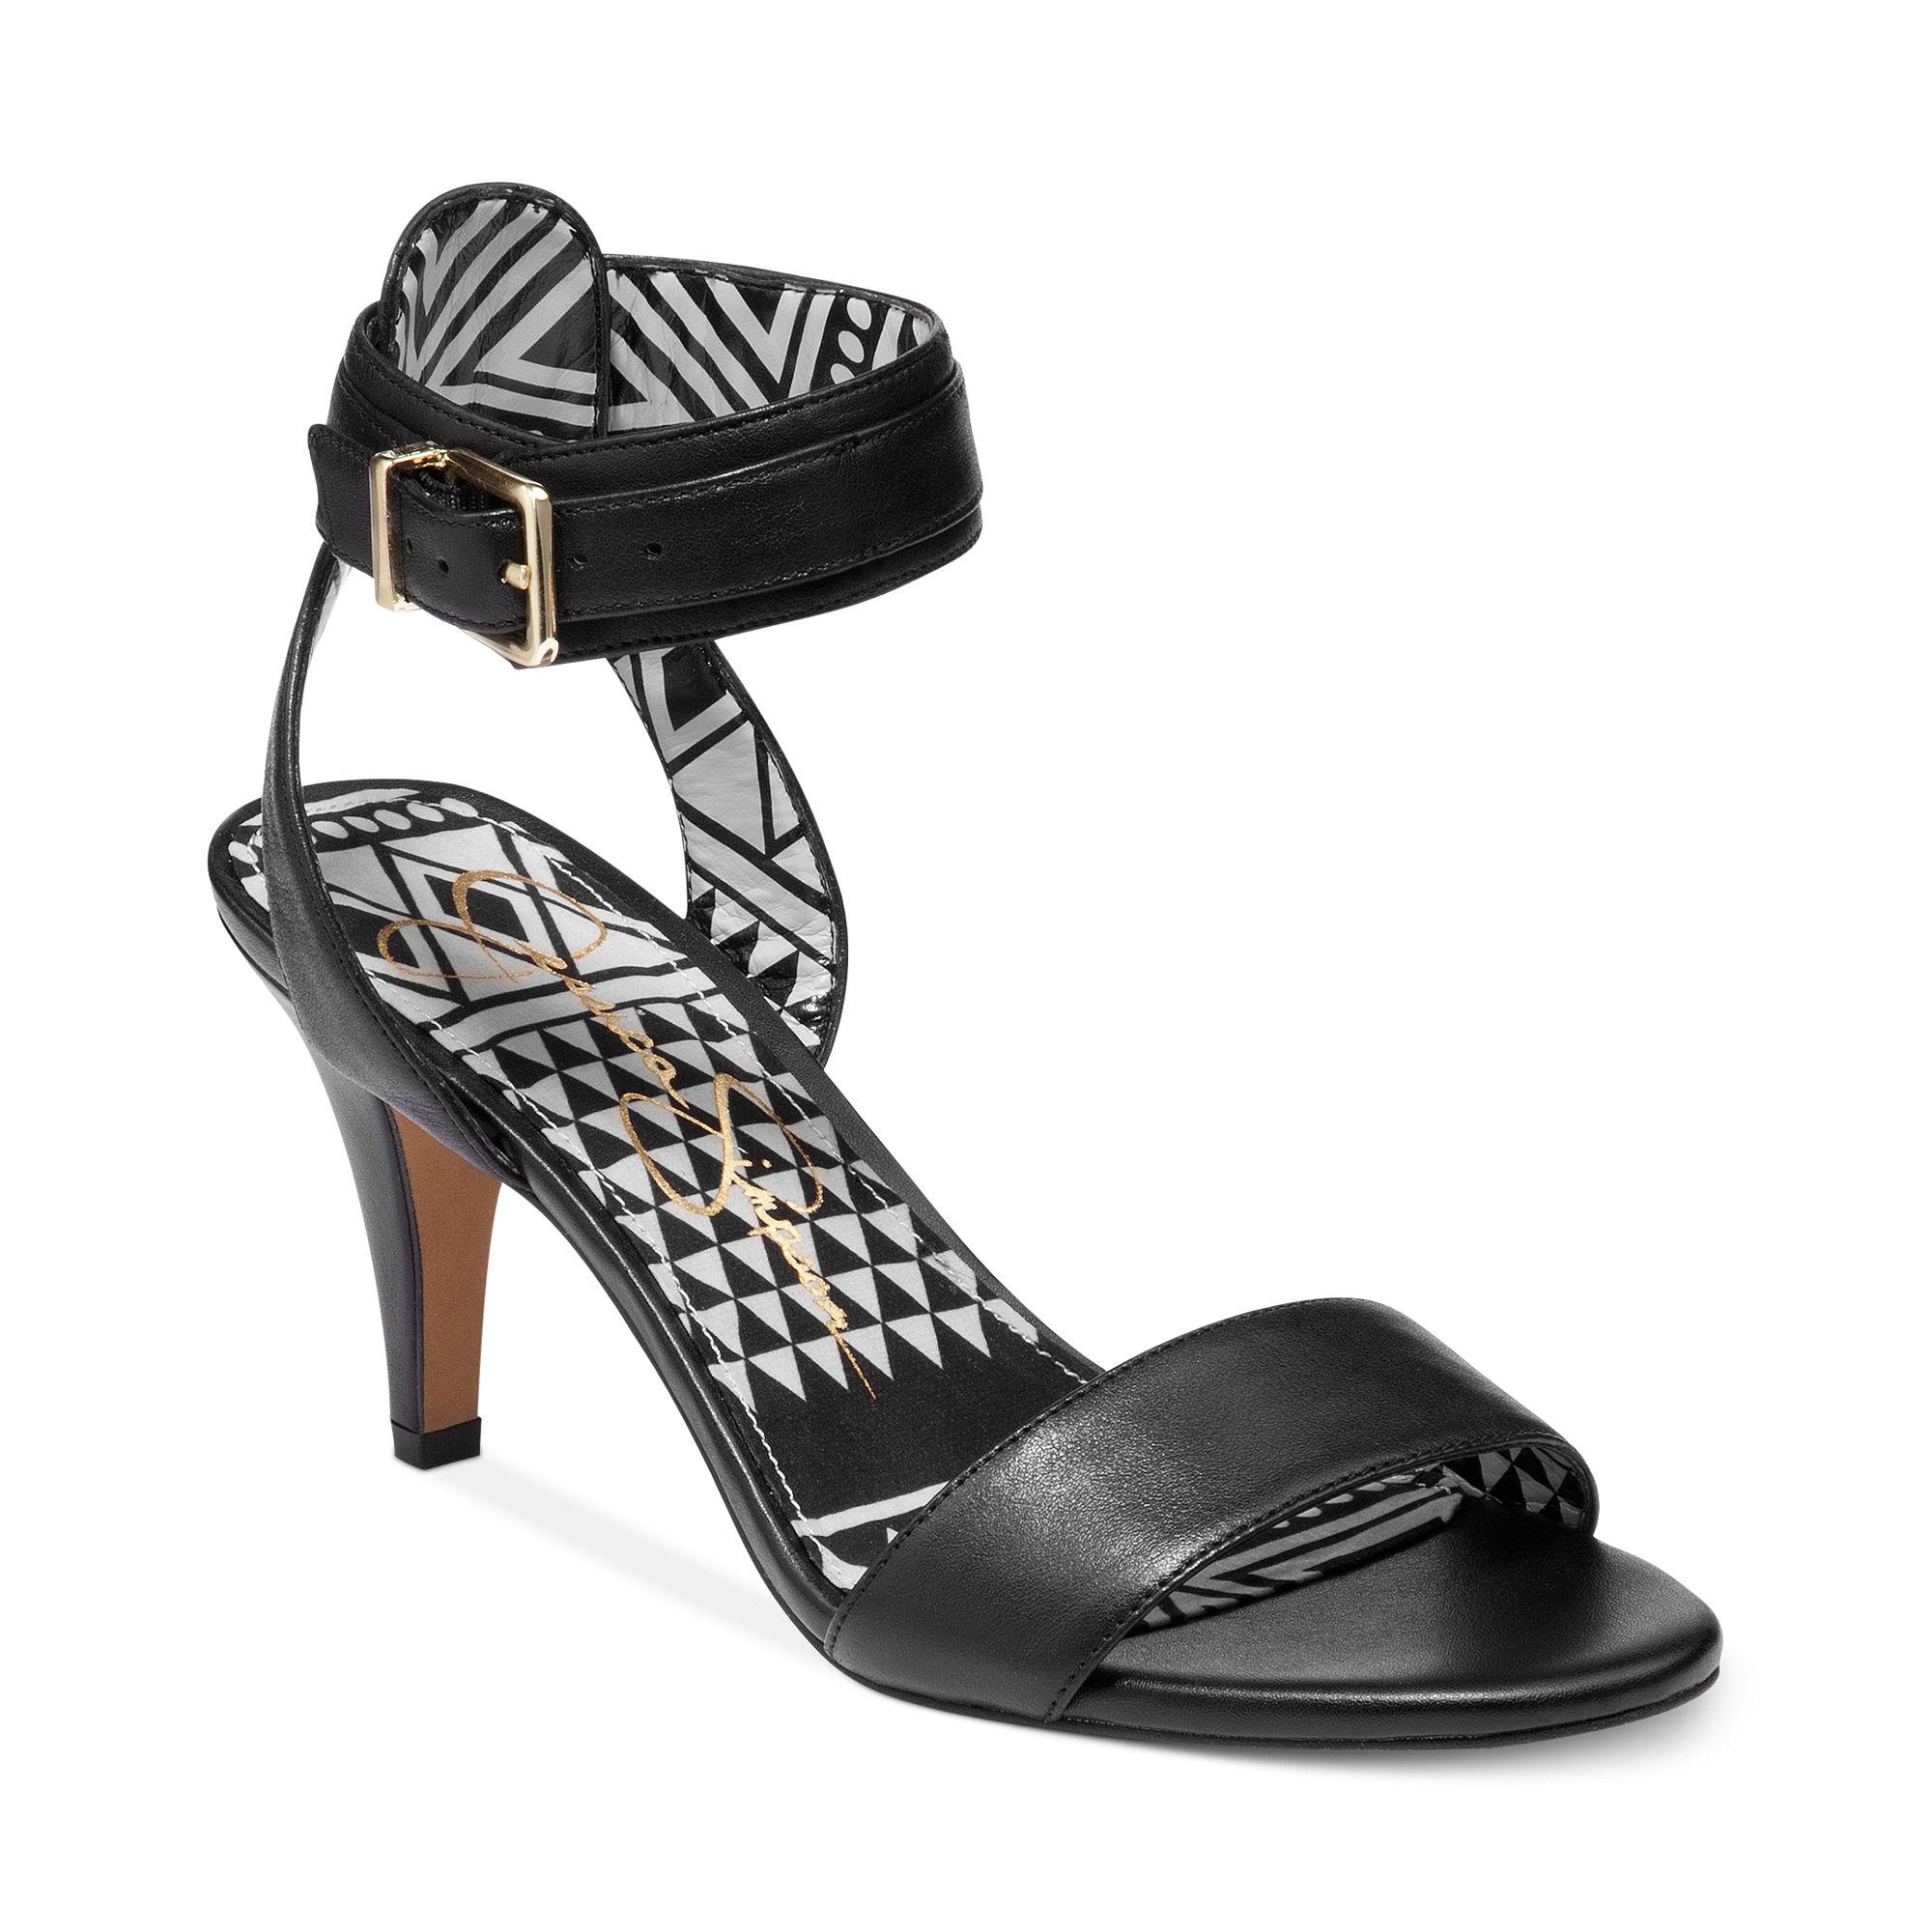 Jessica simpson Erikk Midheel Ankle Strap Sandals in Black | Lyst